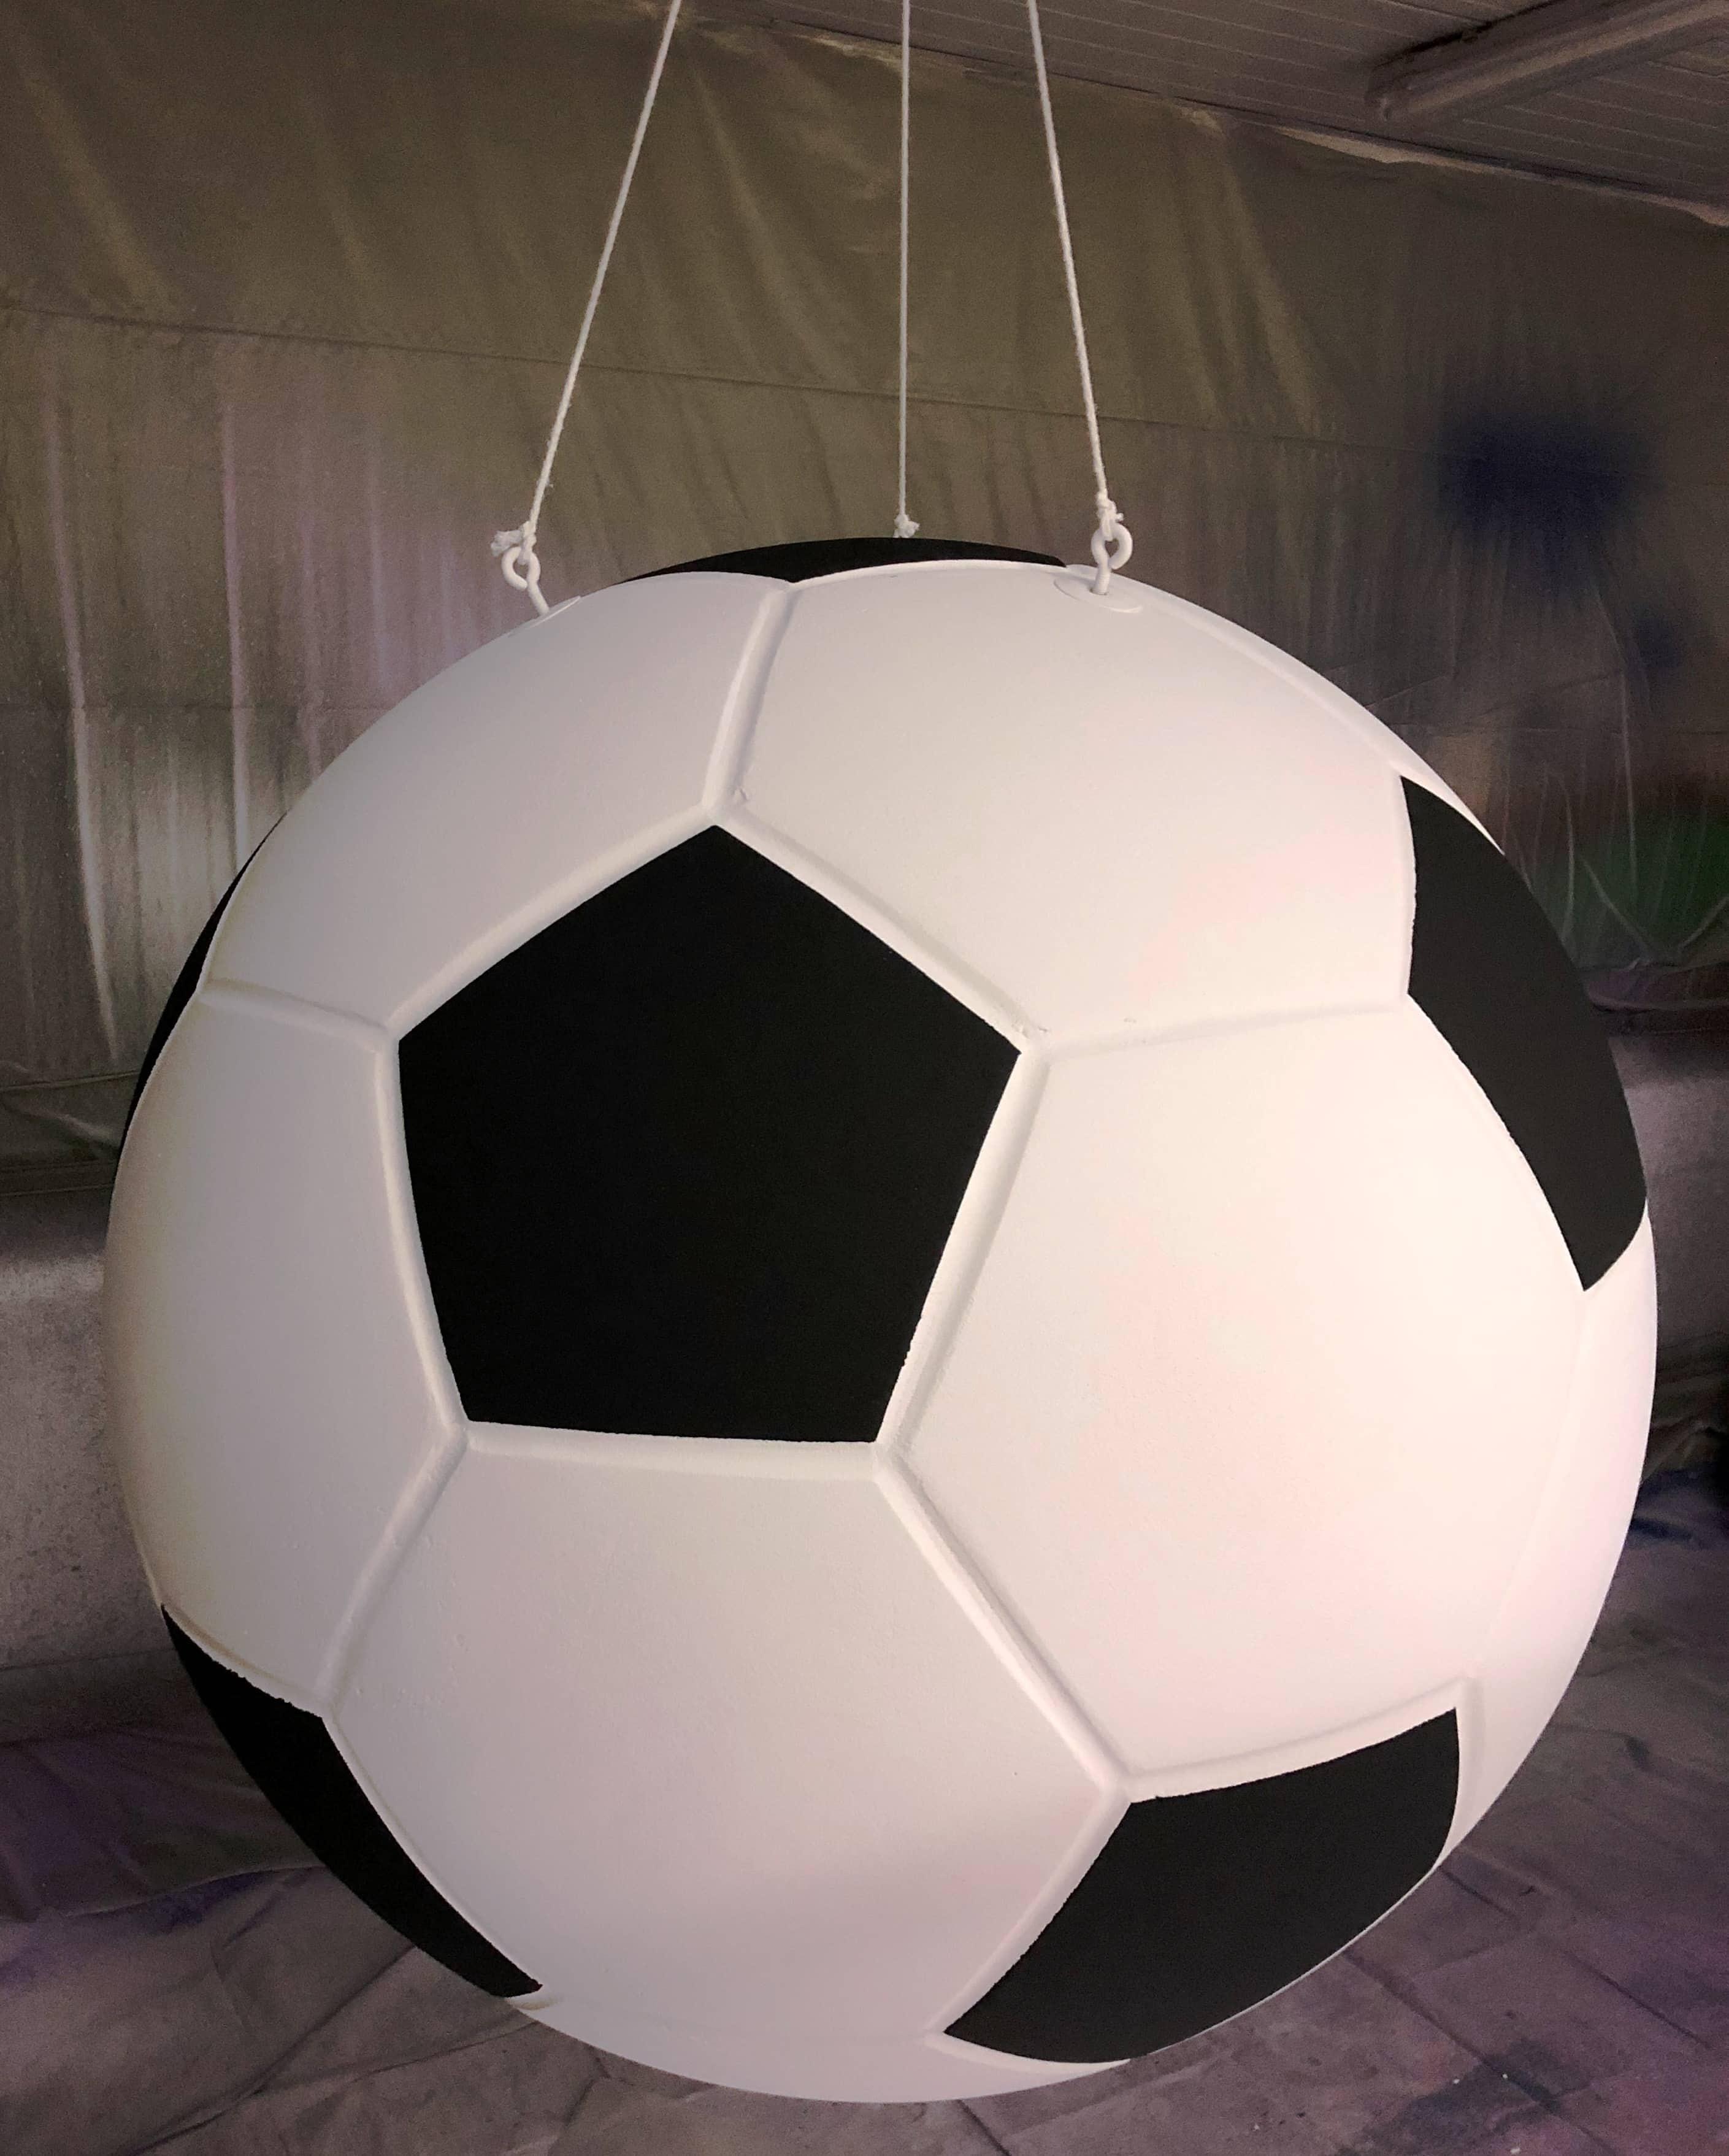 Piepschuim-bal-EPS-voetbal-01